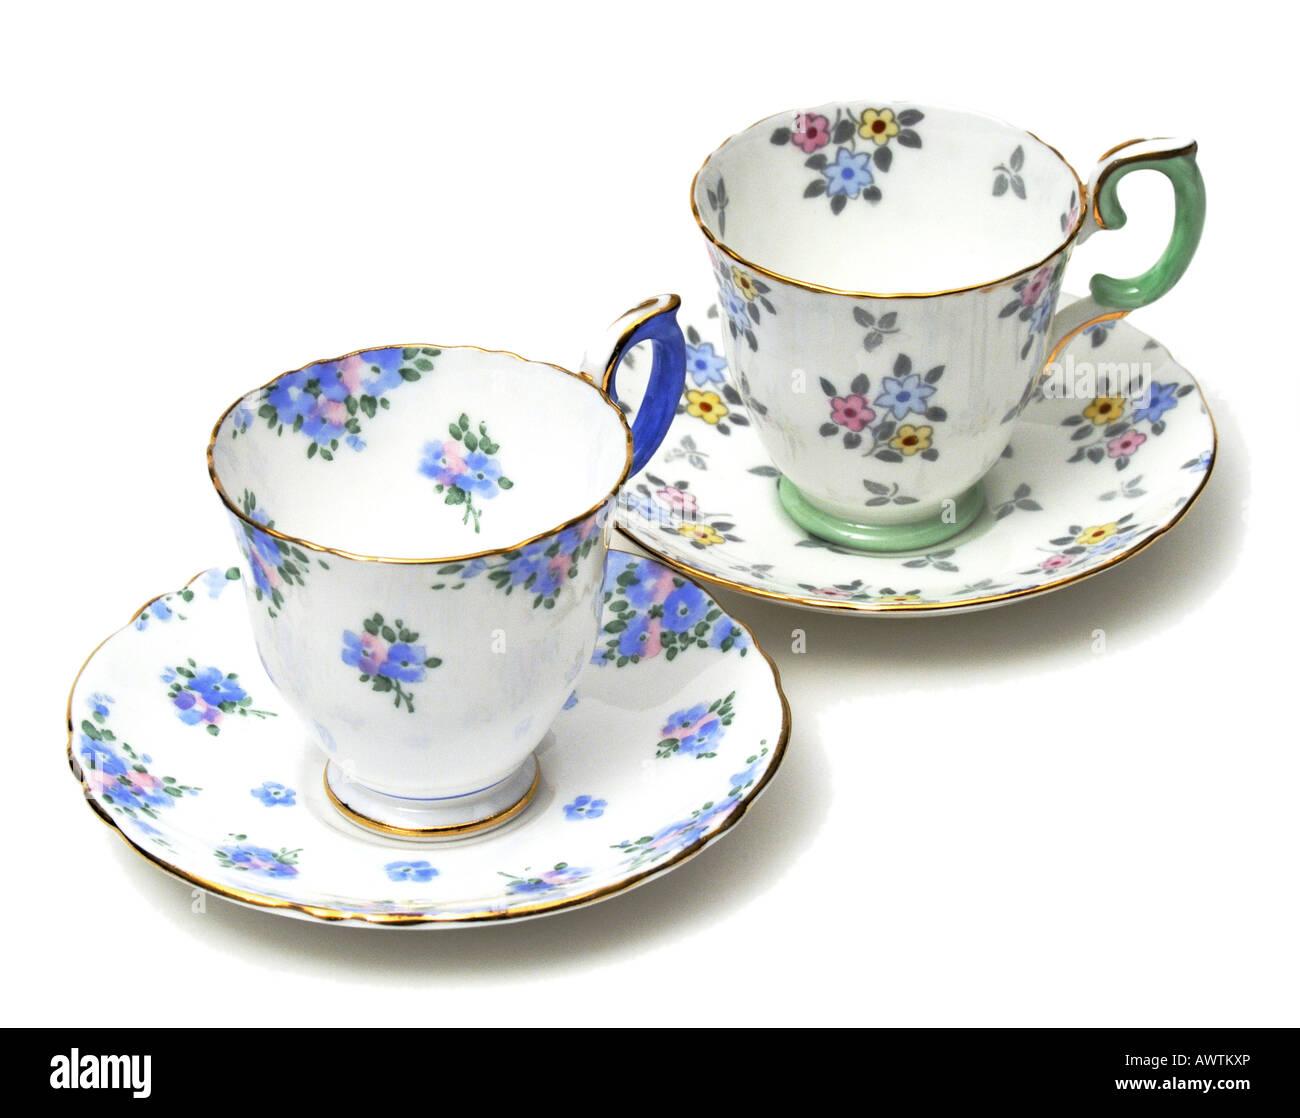 fine english bone china porcelain english ceramics coffee. Black Bedroom Furniture Sets. Home Design Ideas